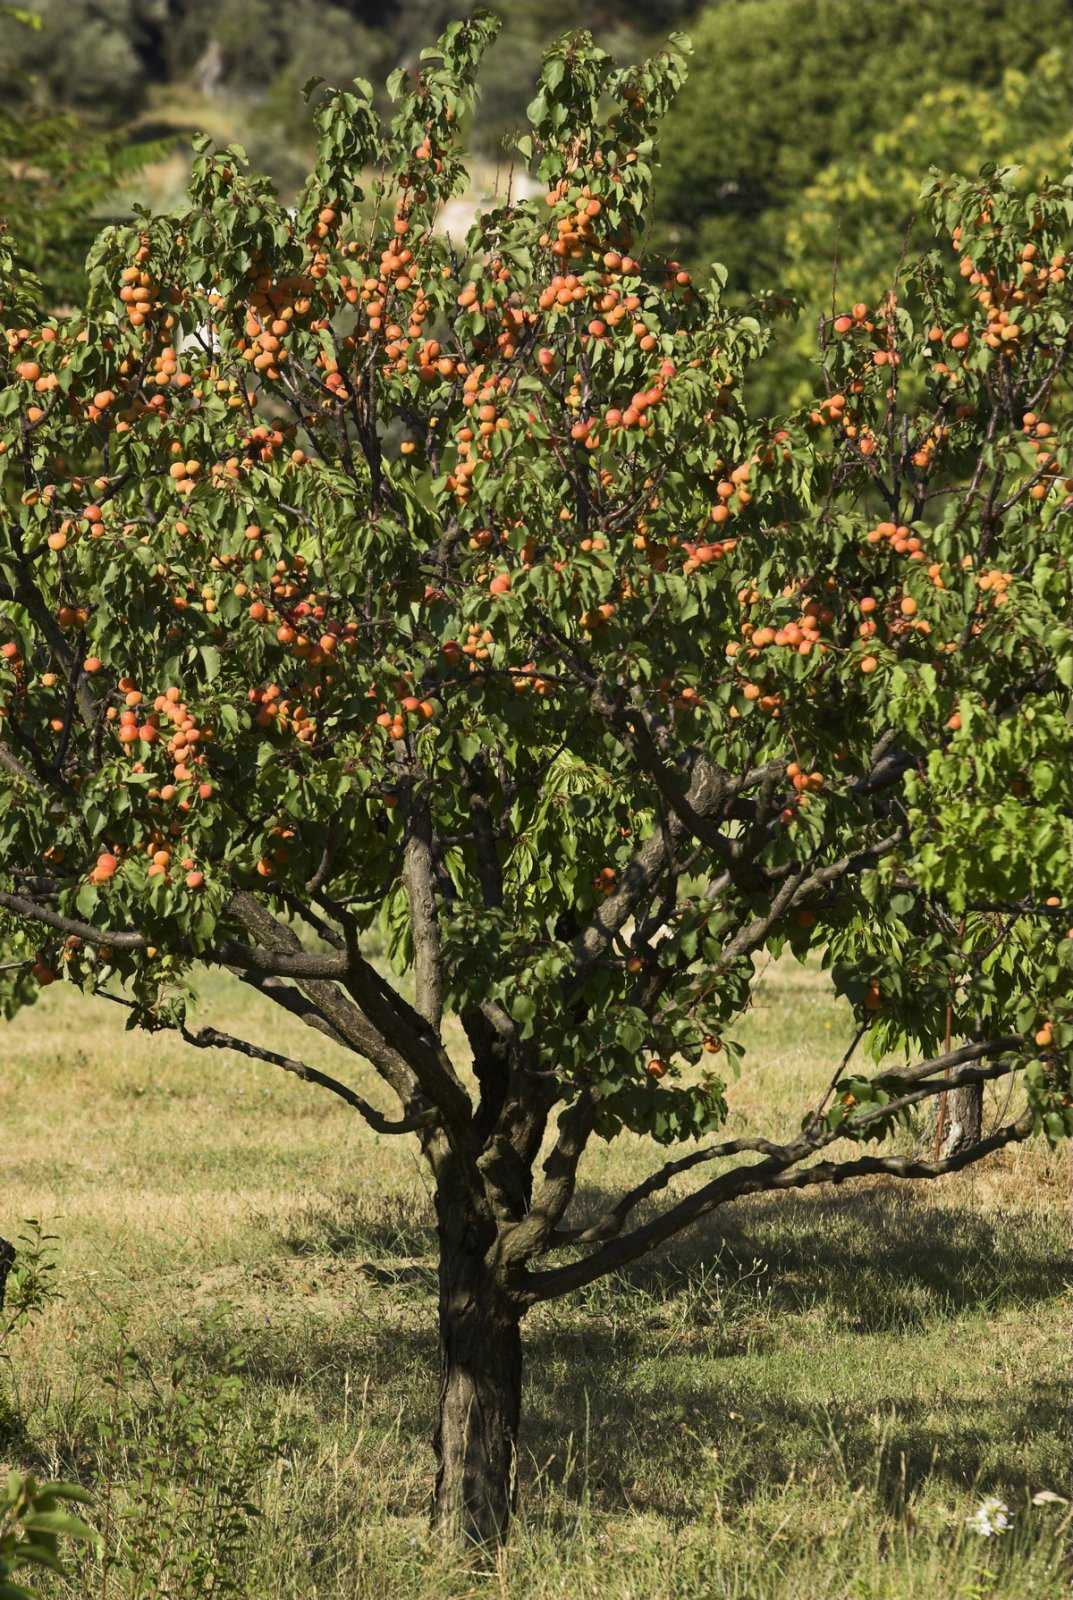 sorta-abrikosa-foto-video-uhod-za-abrikosom-vyrashhivanie-v-srednej-polose-2